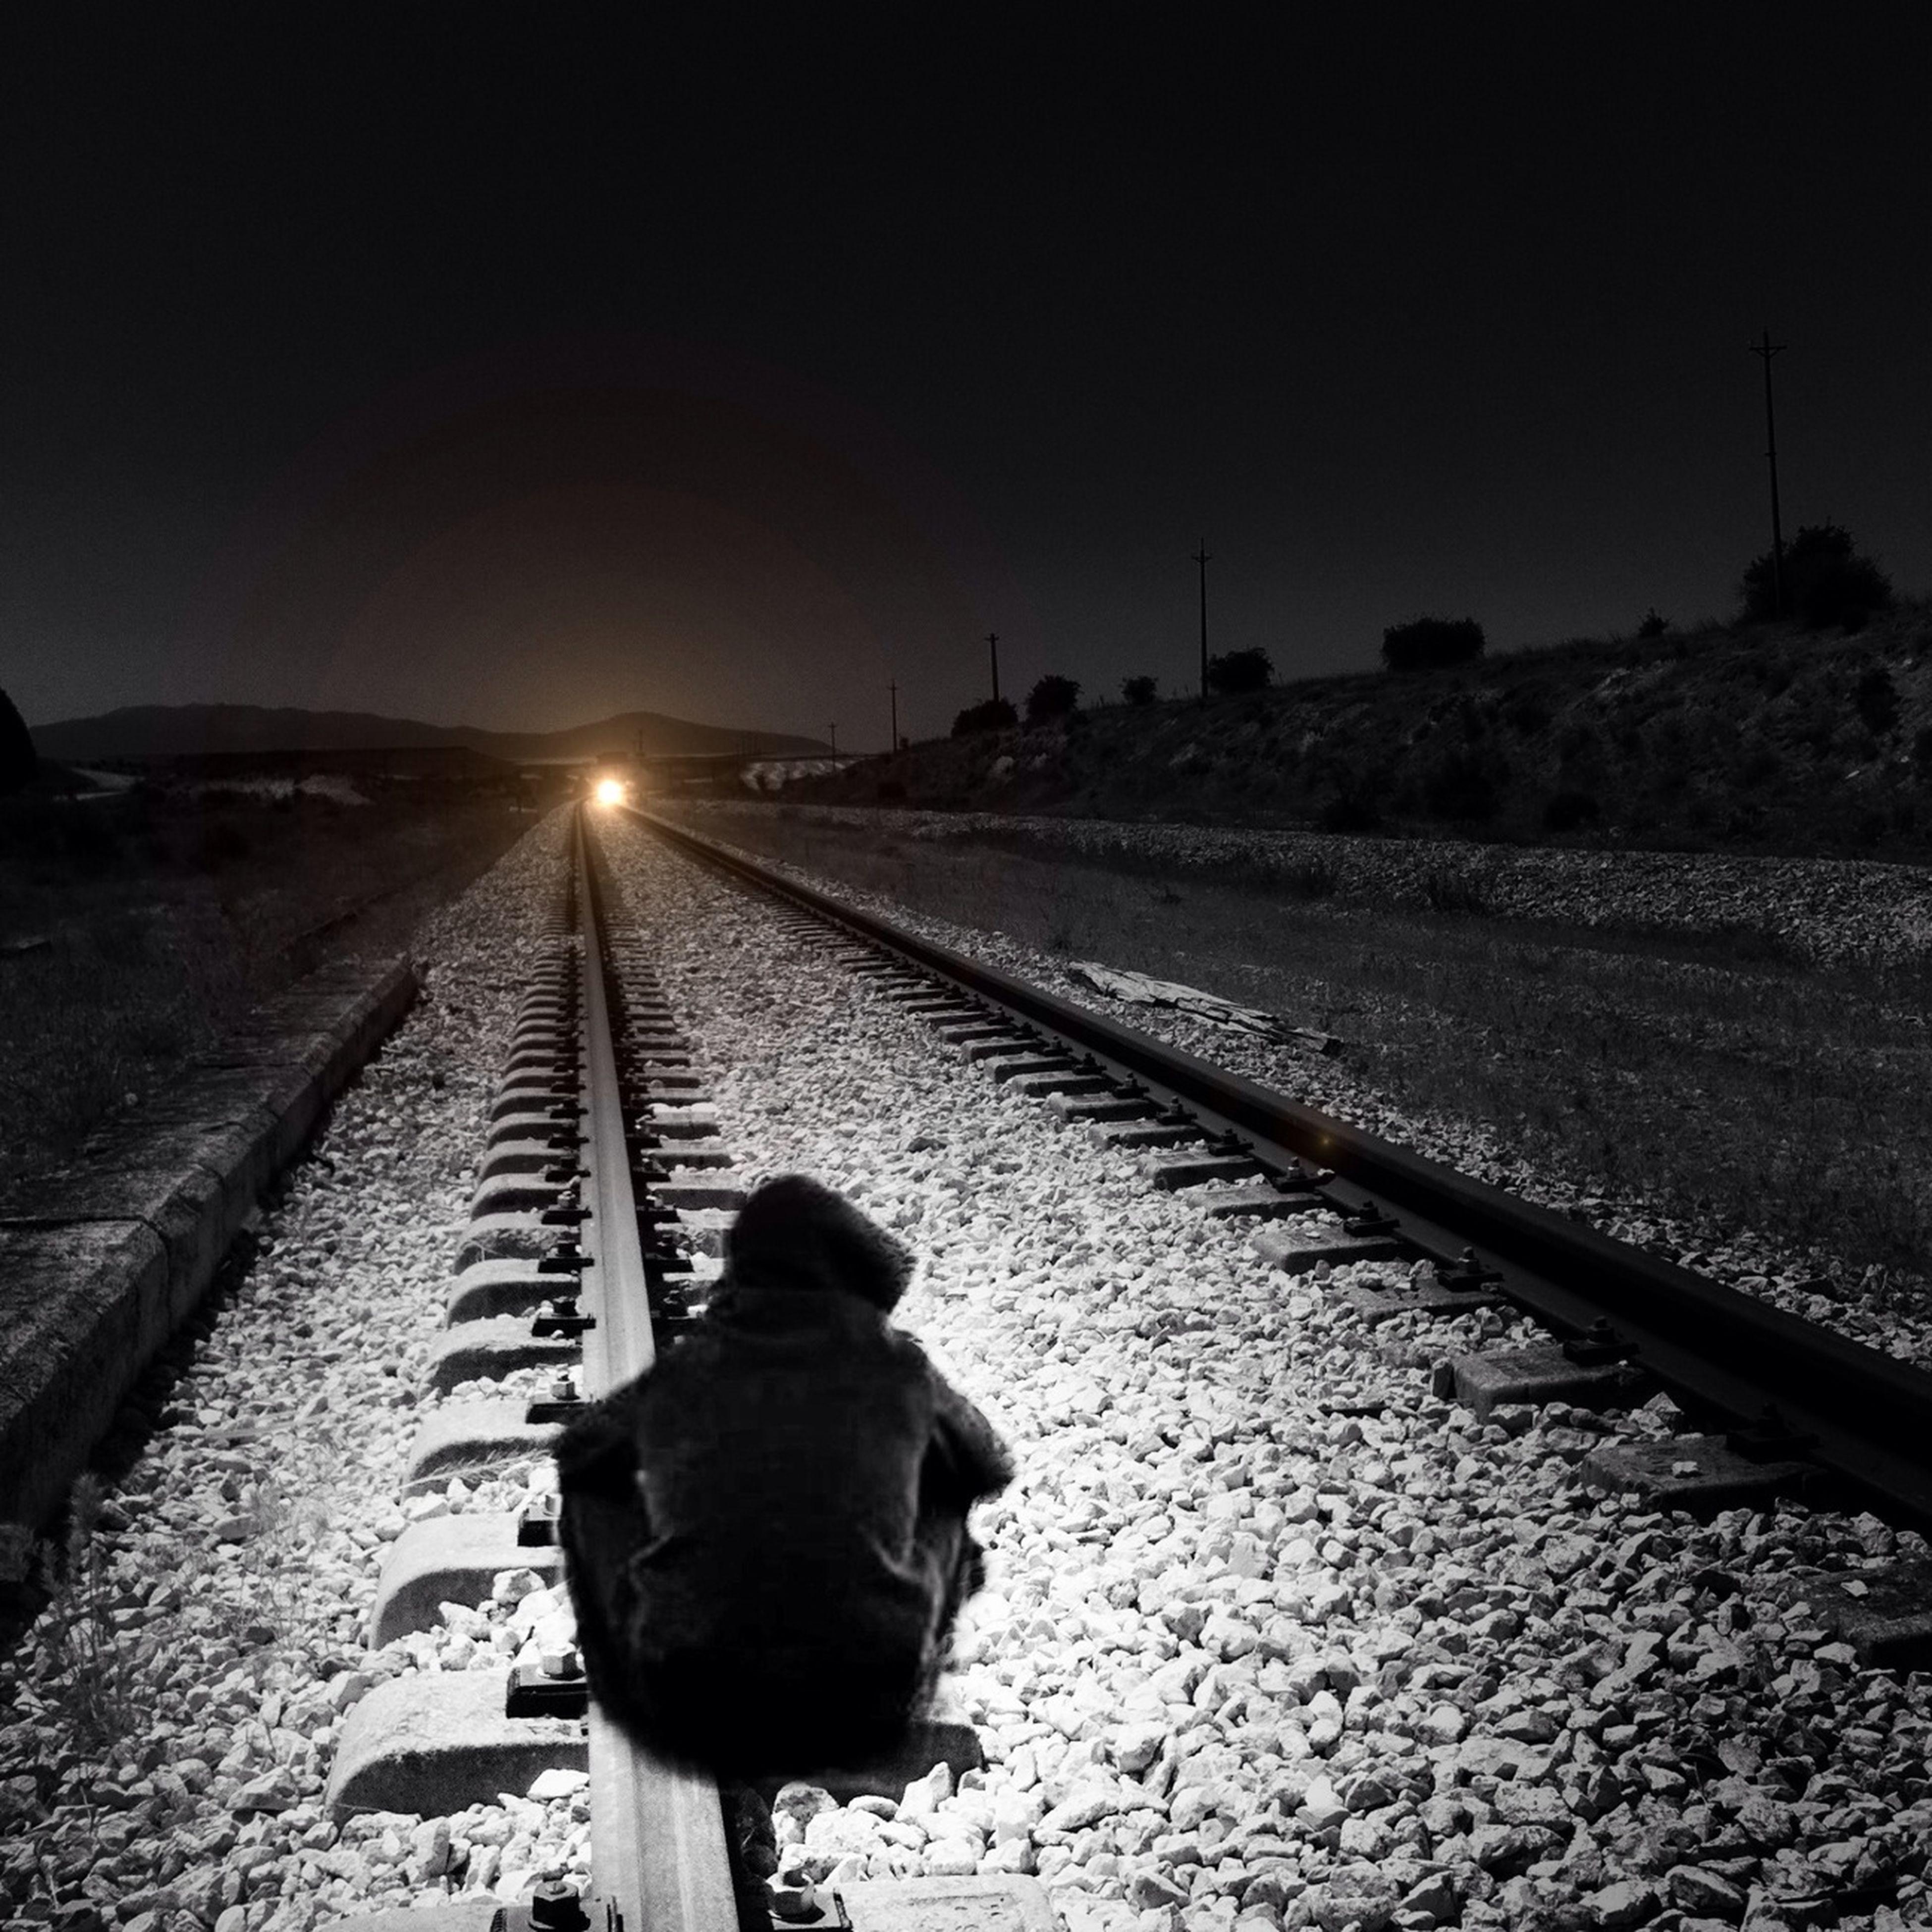 Train, Light, Boy